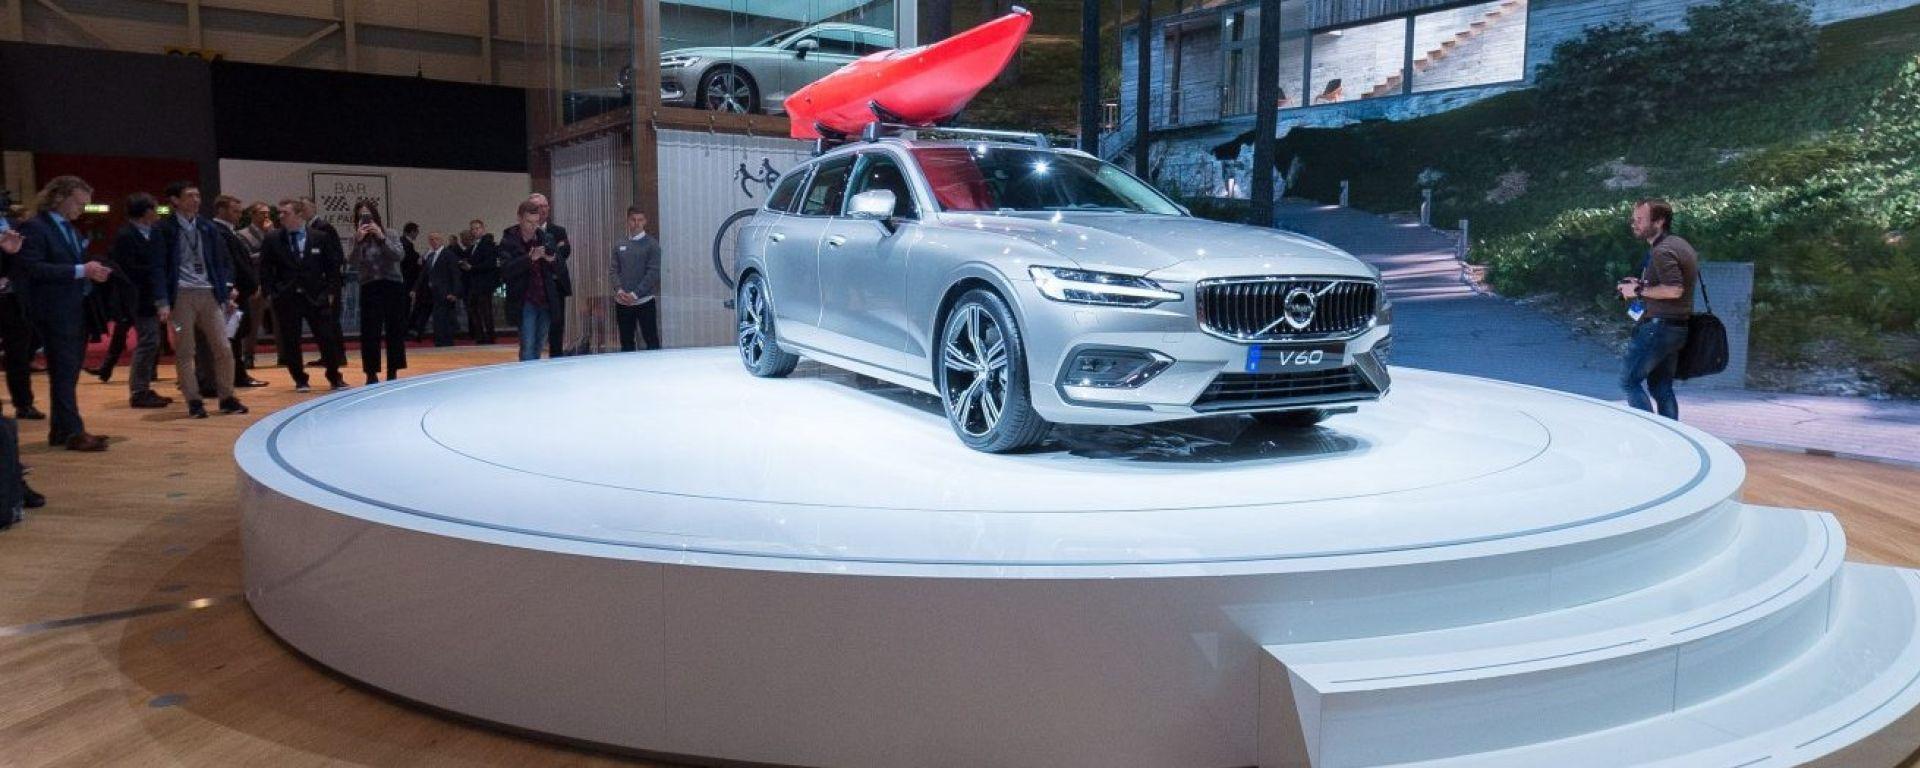 Volvo V60, live Salone di ginevra 2018